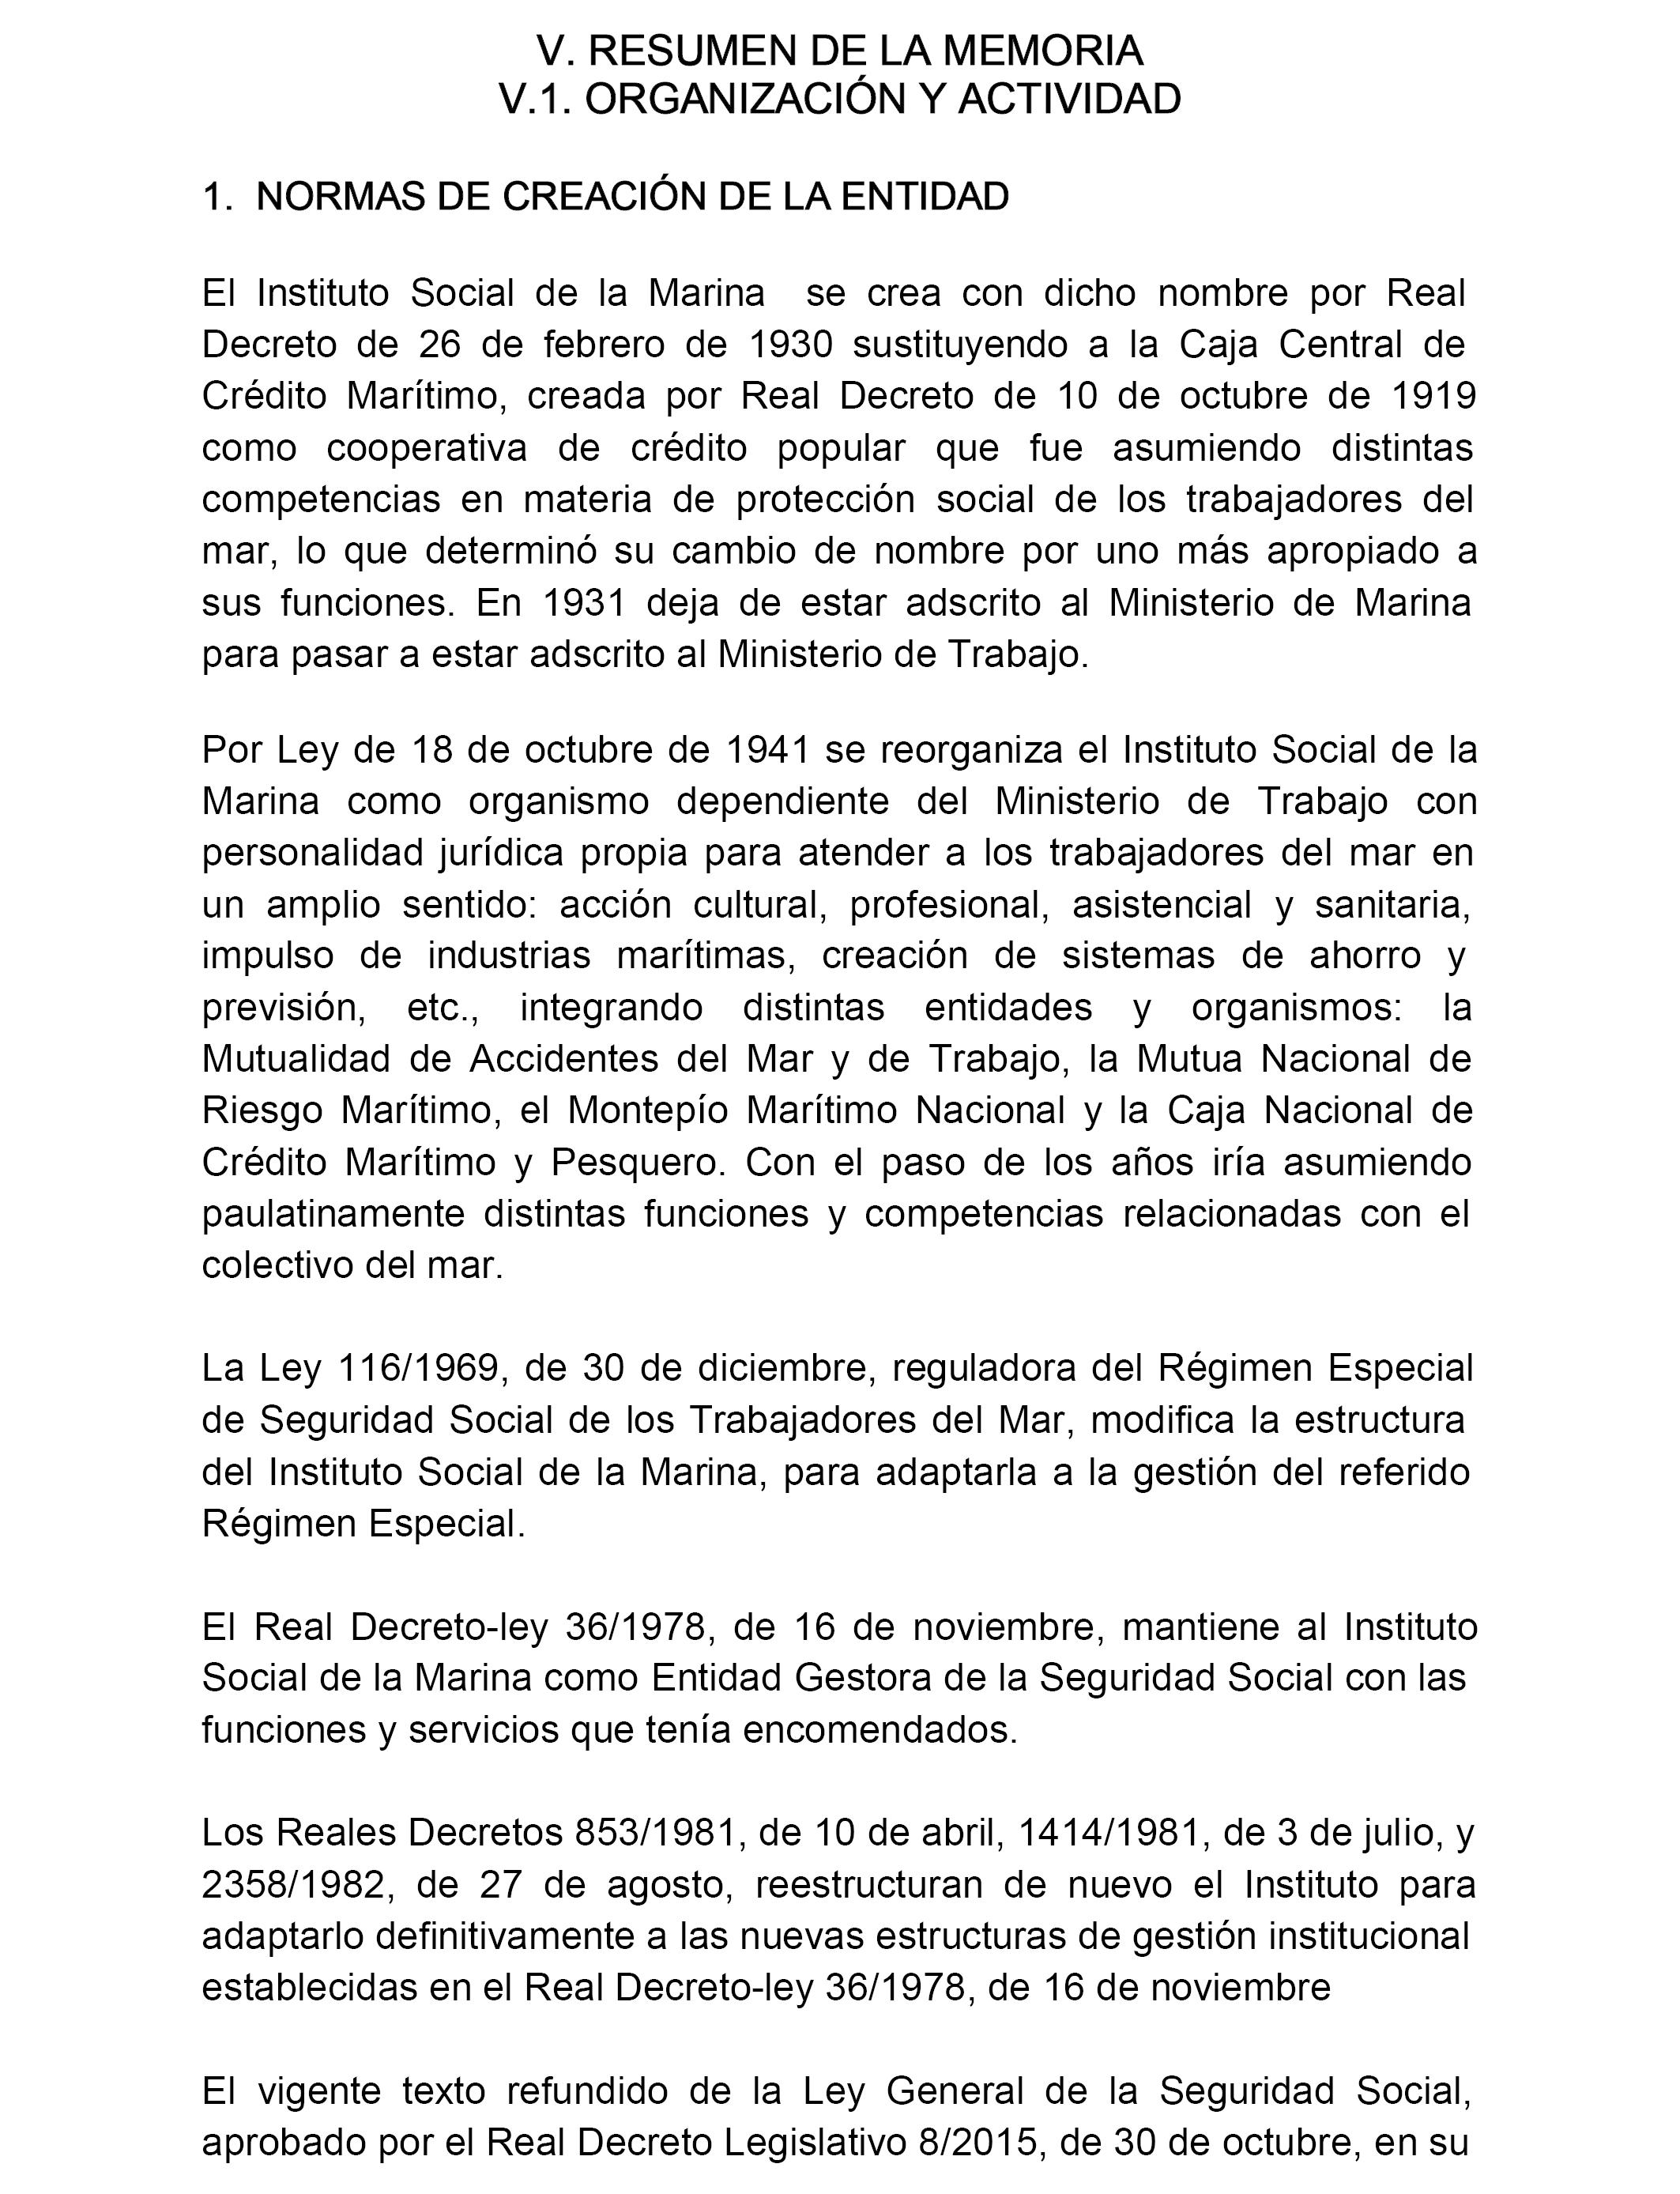 BOE.es - Documento BOE-A-2017-12768